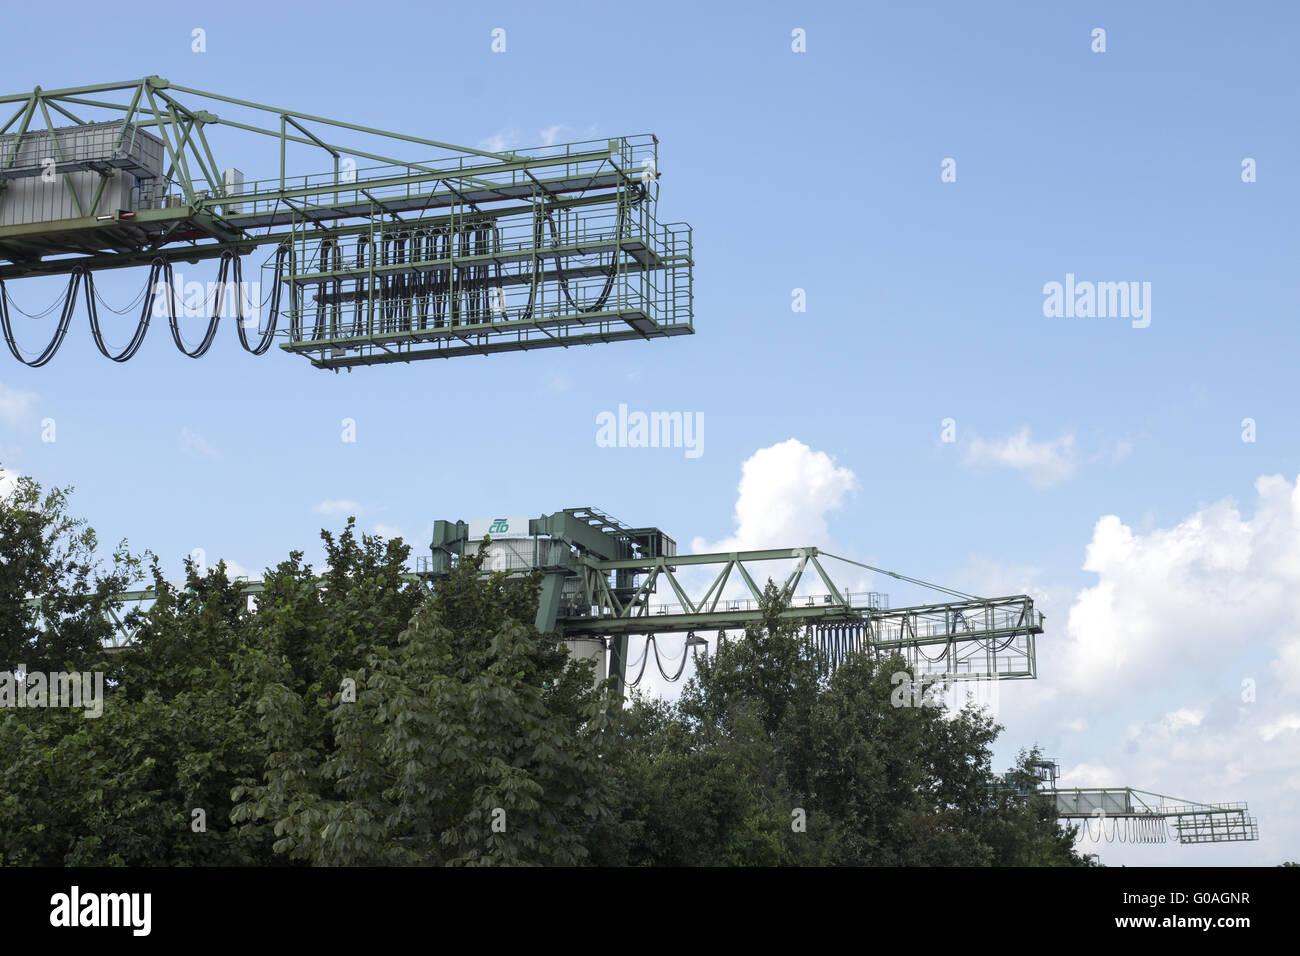 Gantry crane, container harbour Dortmund, Germany Stock Photo